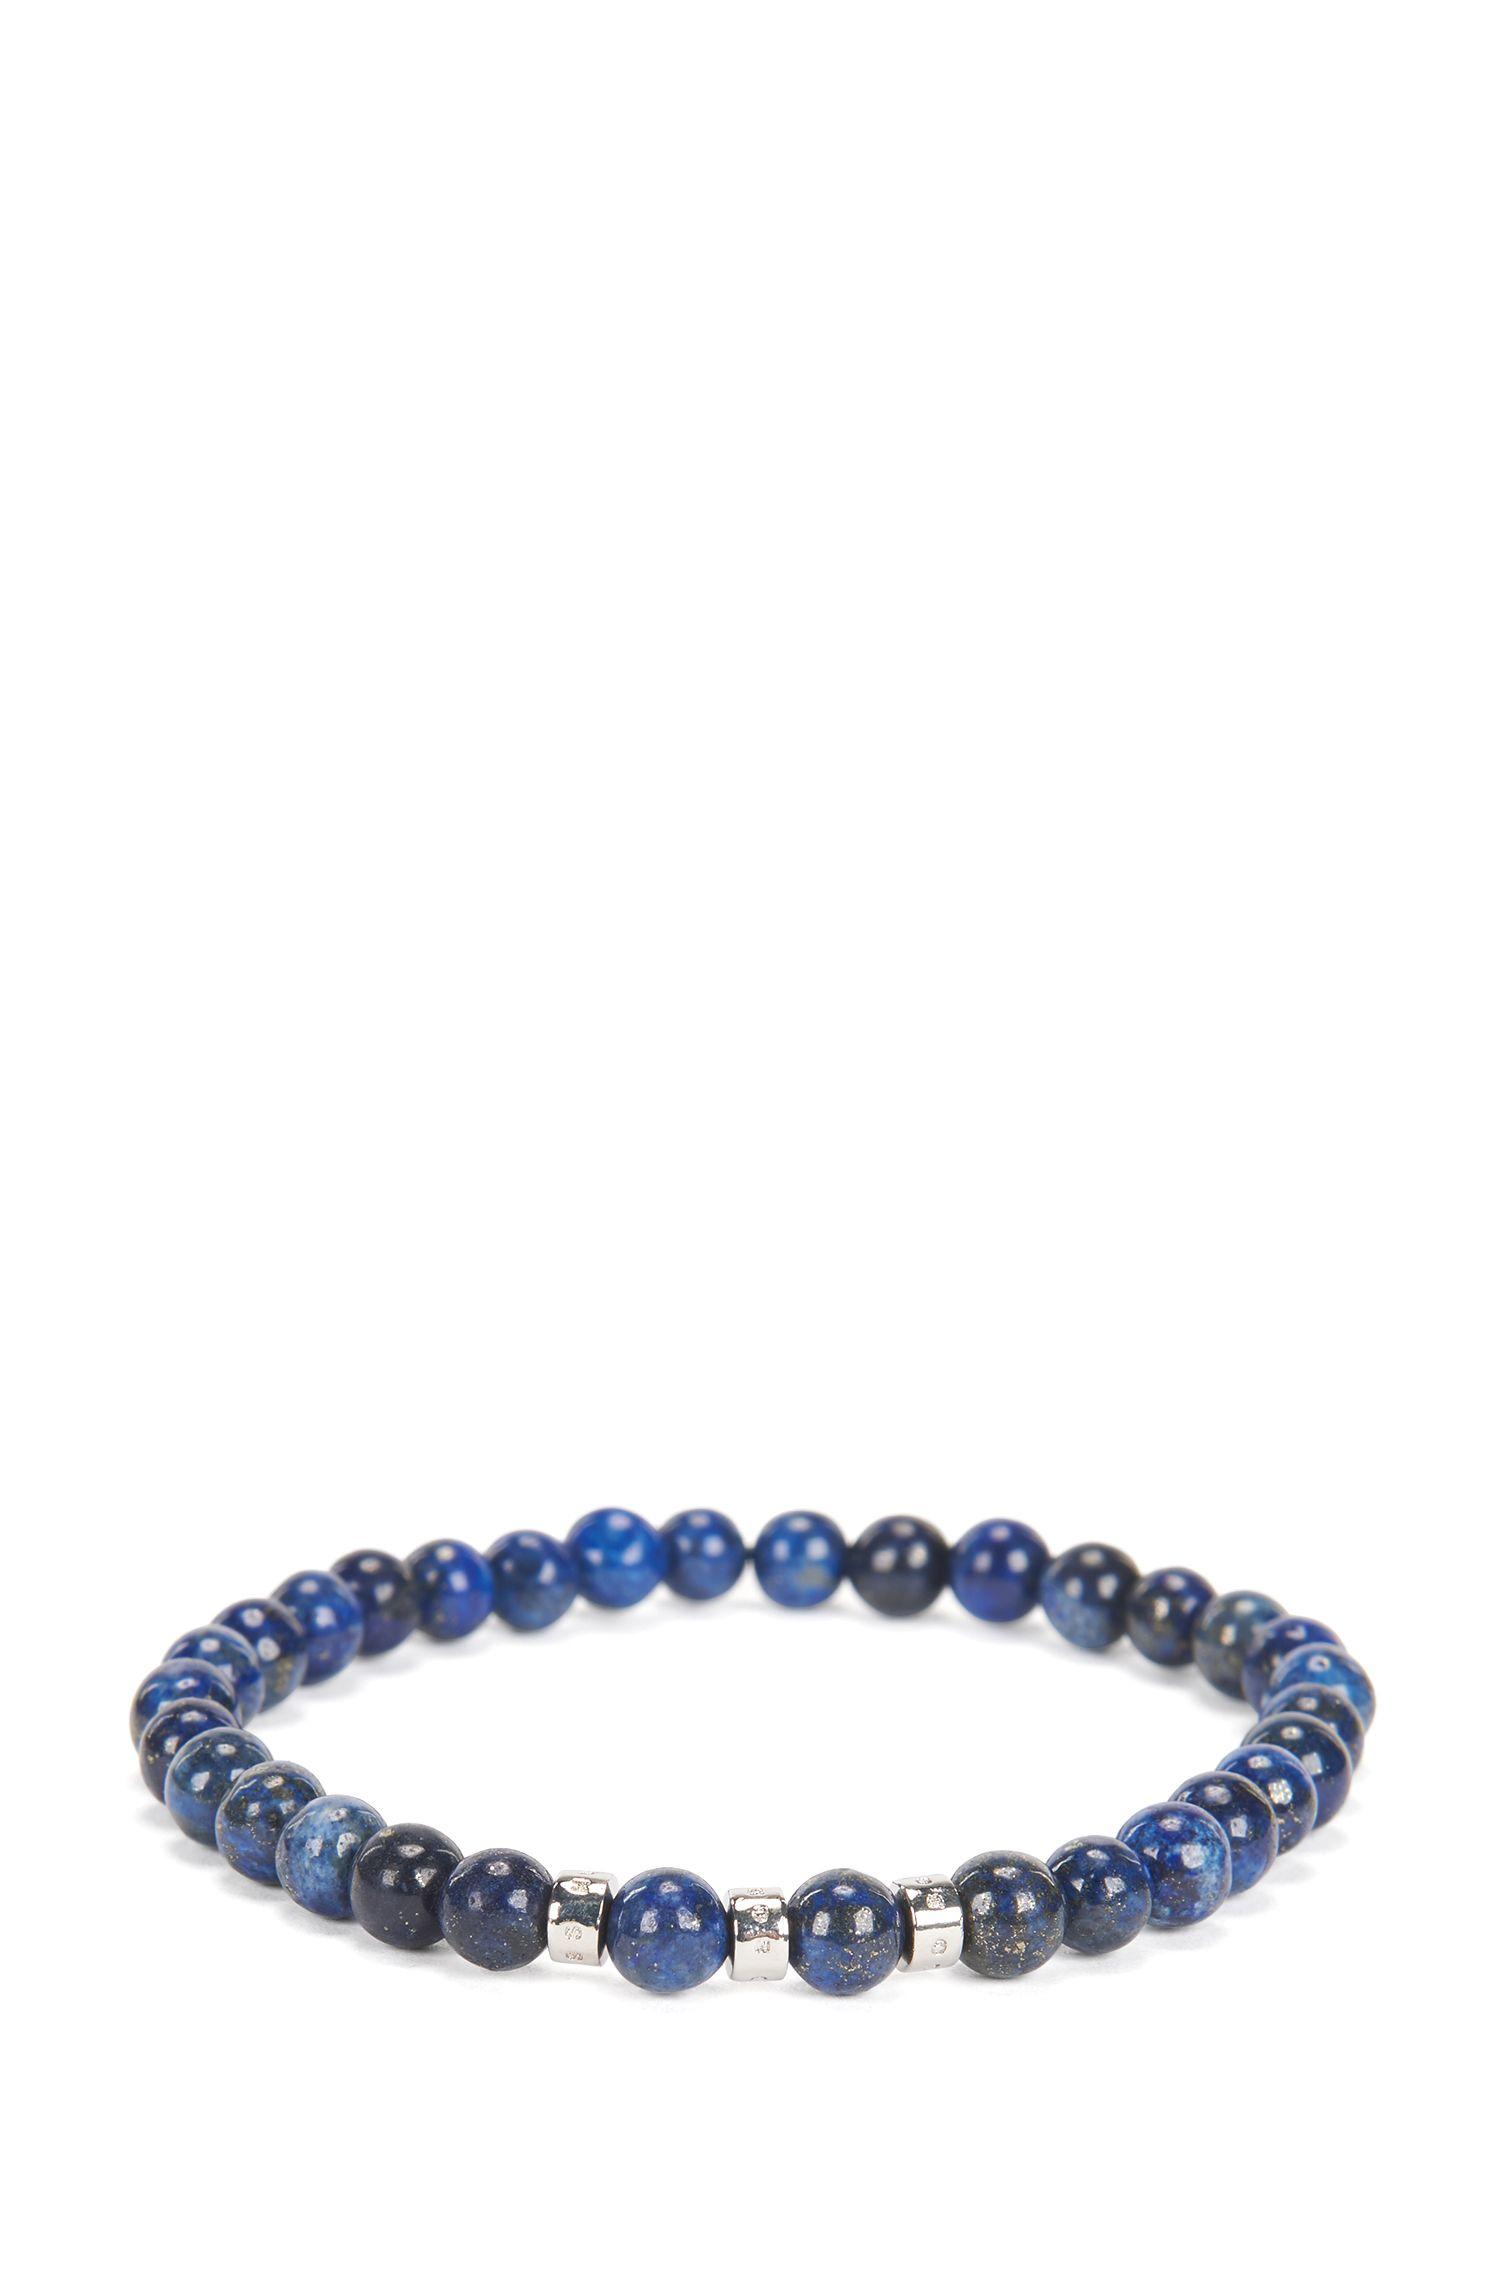 Lapis Bracelet | Bernie